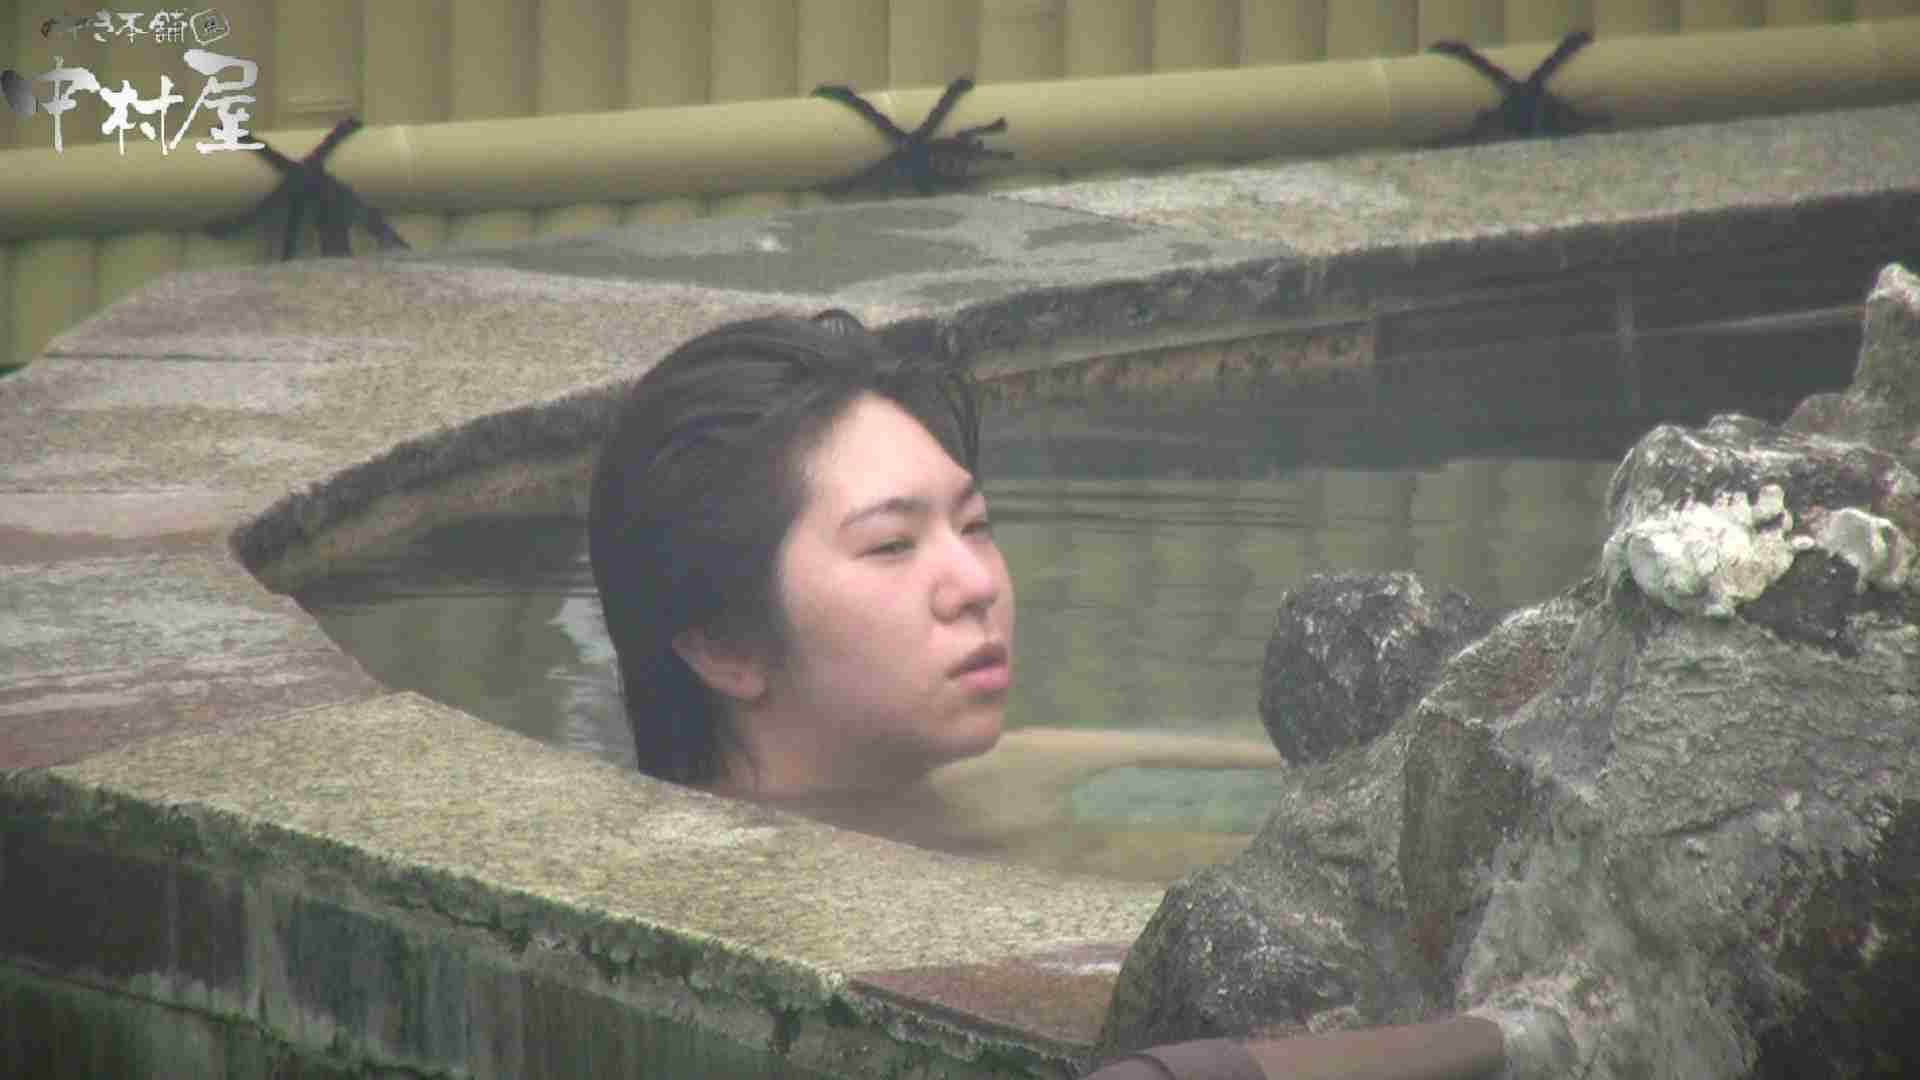 Aquaな露天風呂Vol.907 盗撮特撮 | OLのプライベート  12pic 10